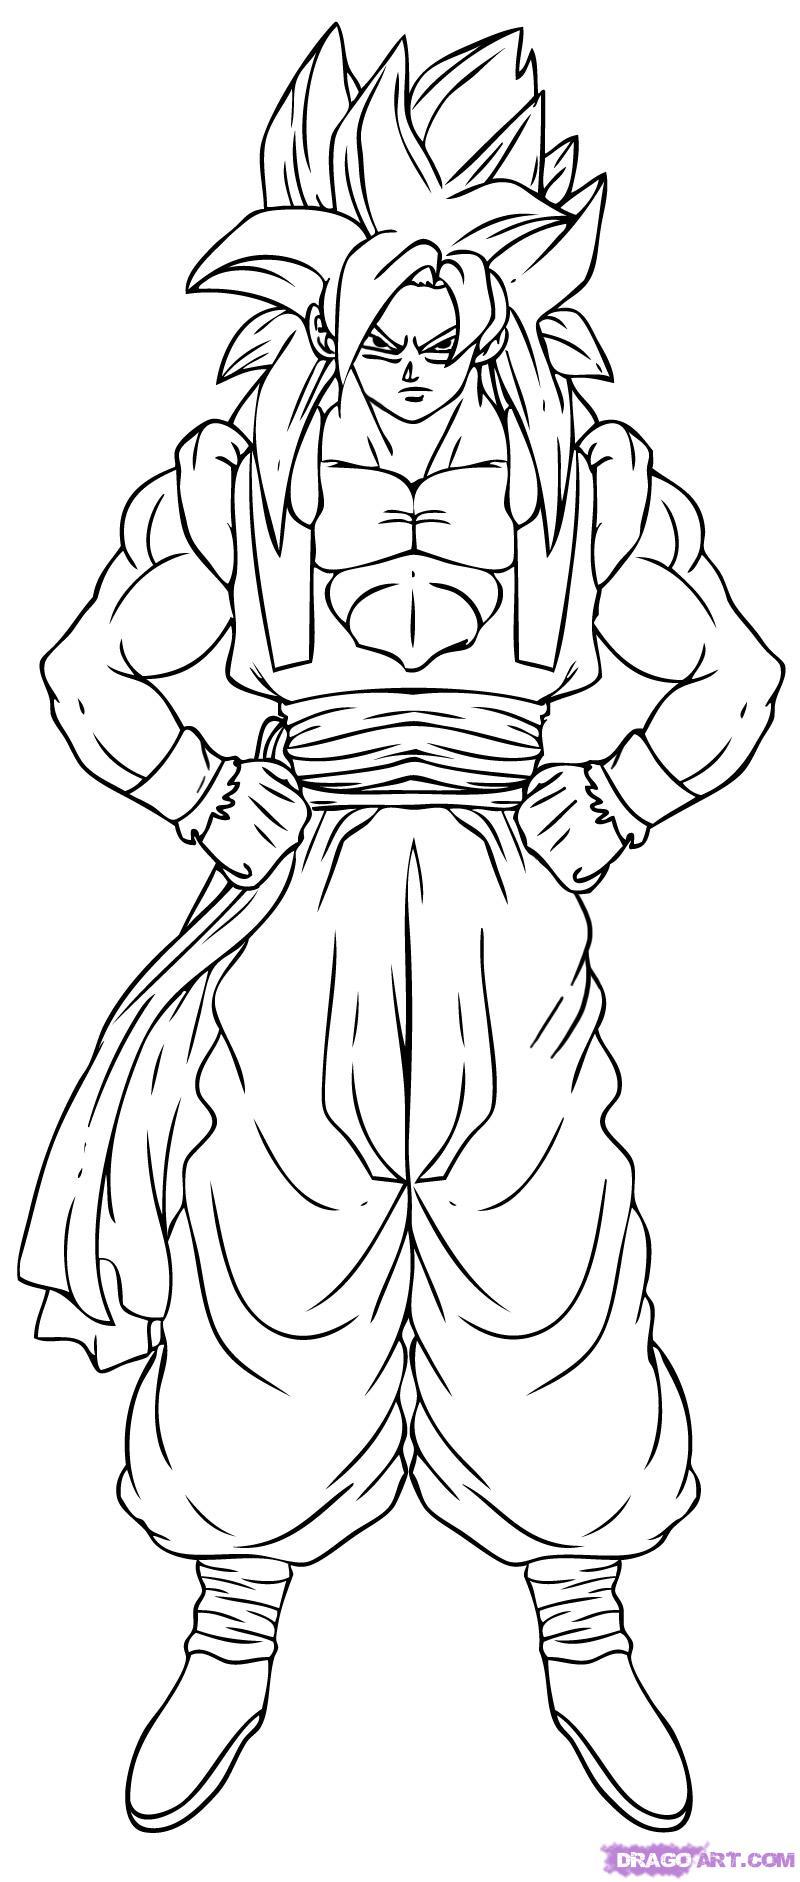 Coloriages imprimer Son Goku num ro 282095